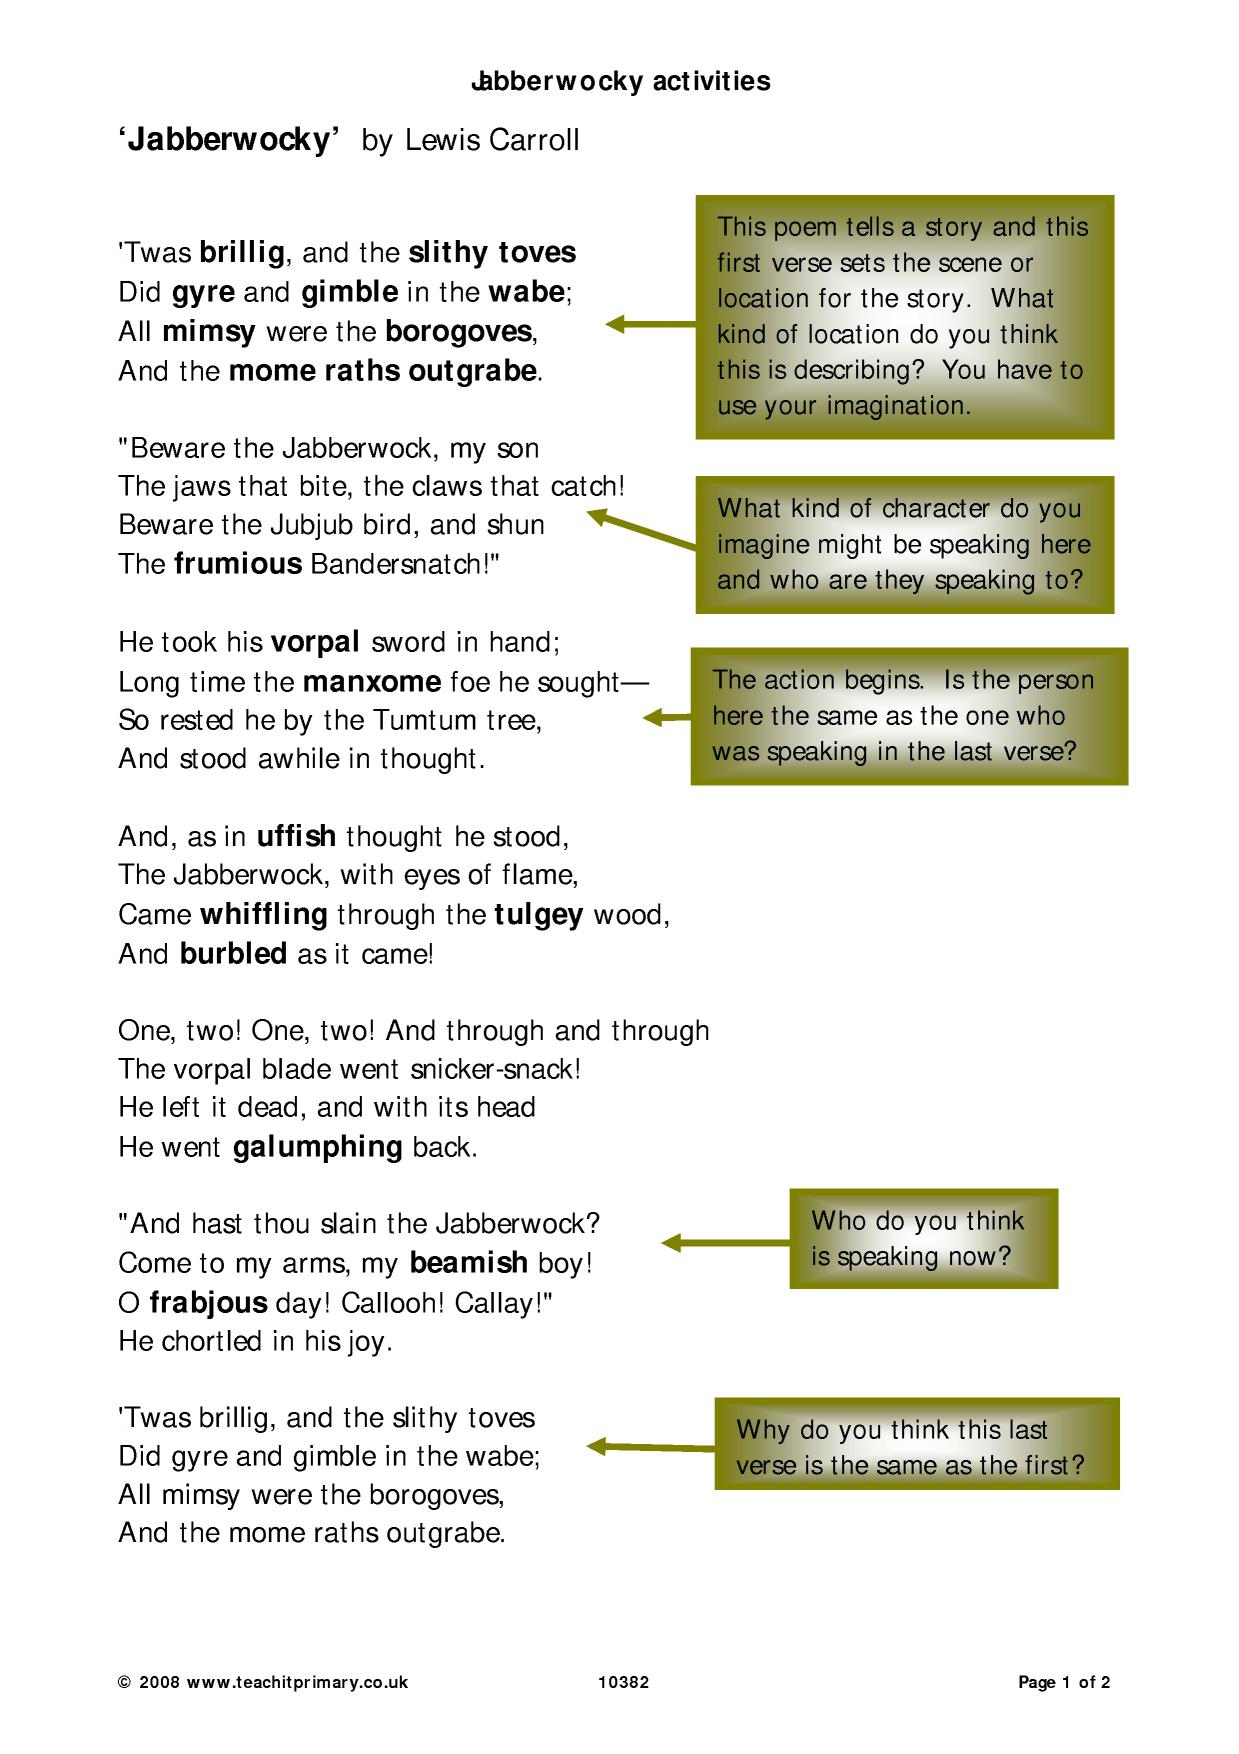 Jabberwocky Poem Meaning